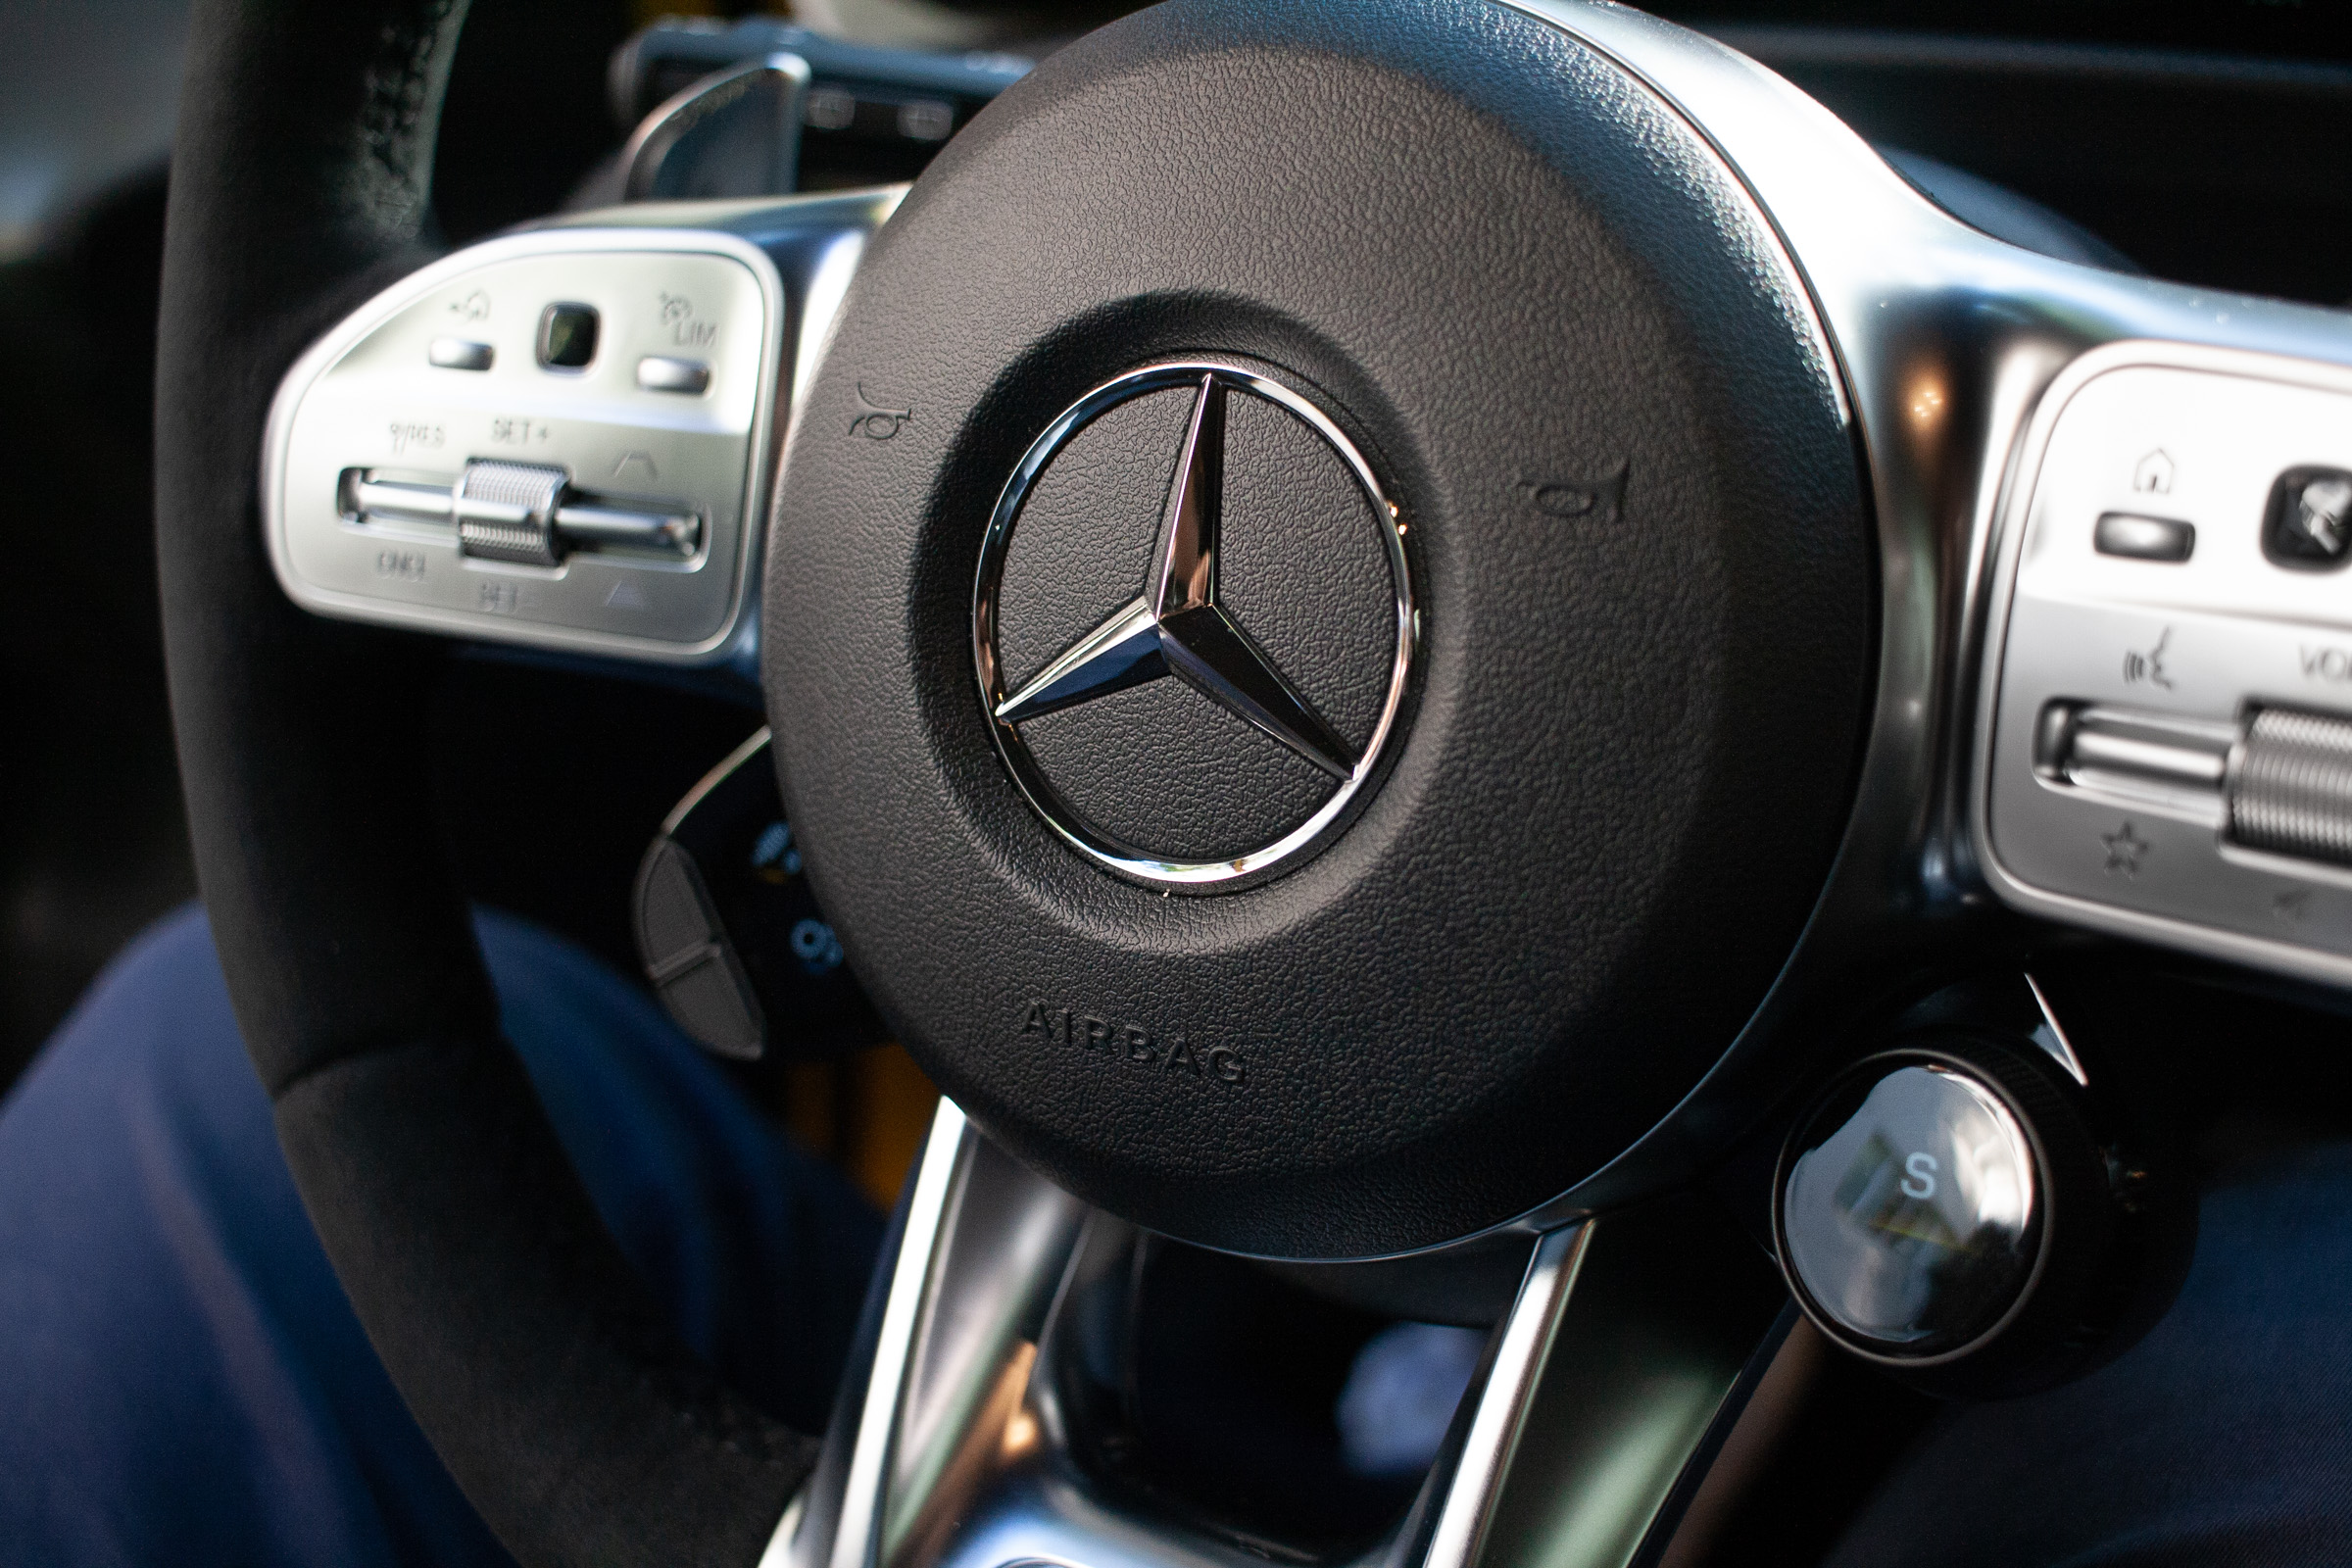 Mercedes A 35 AMG